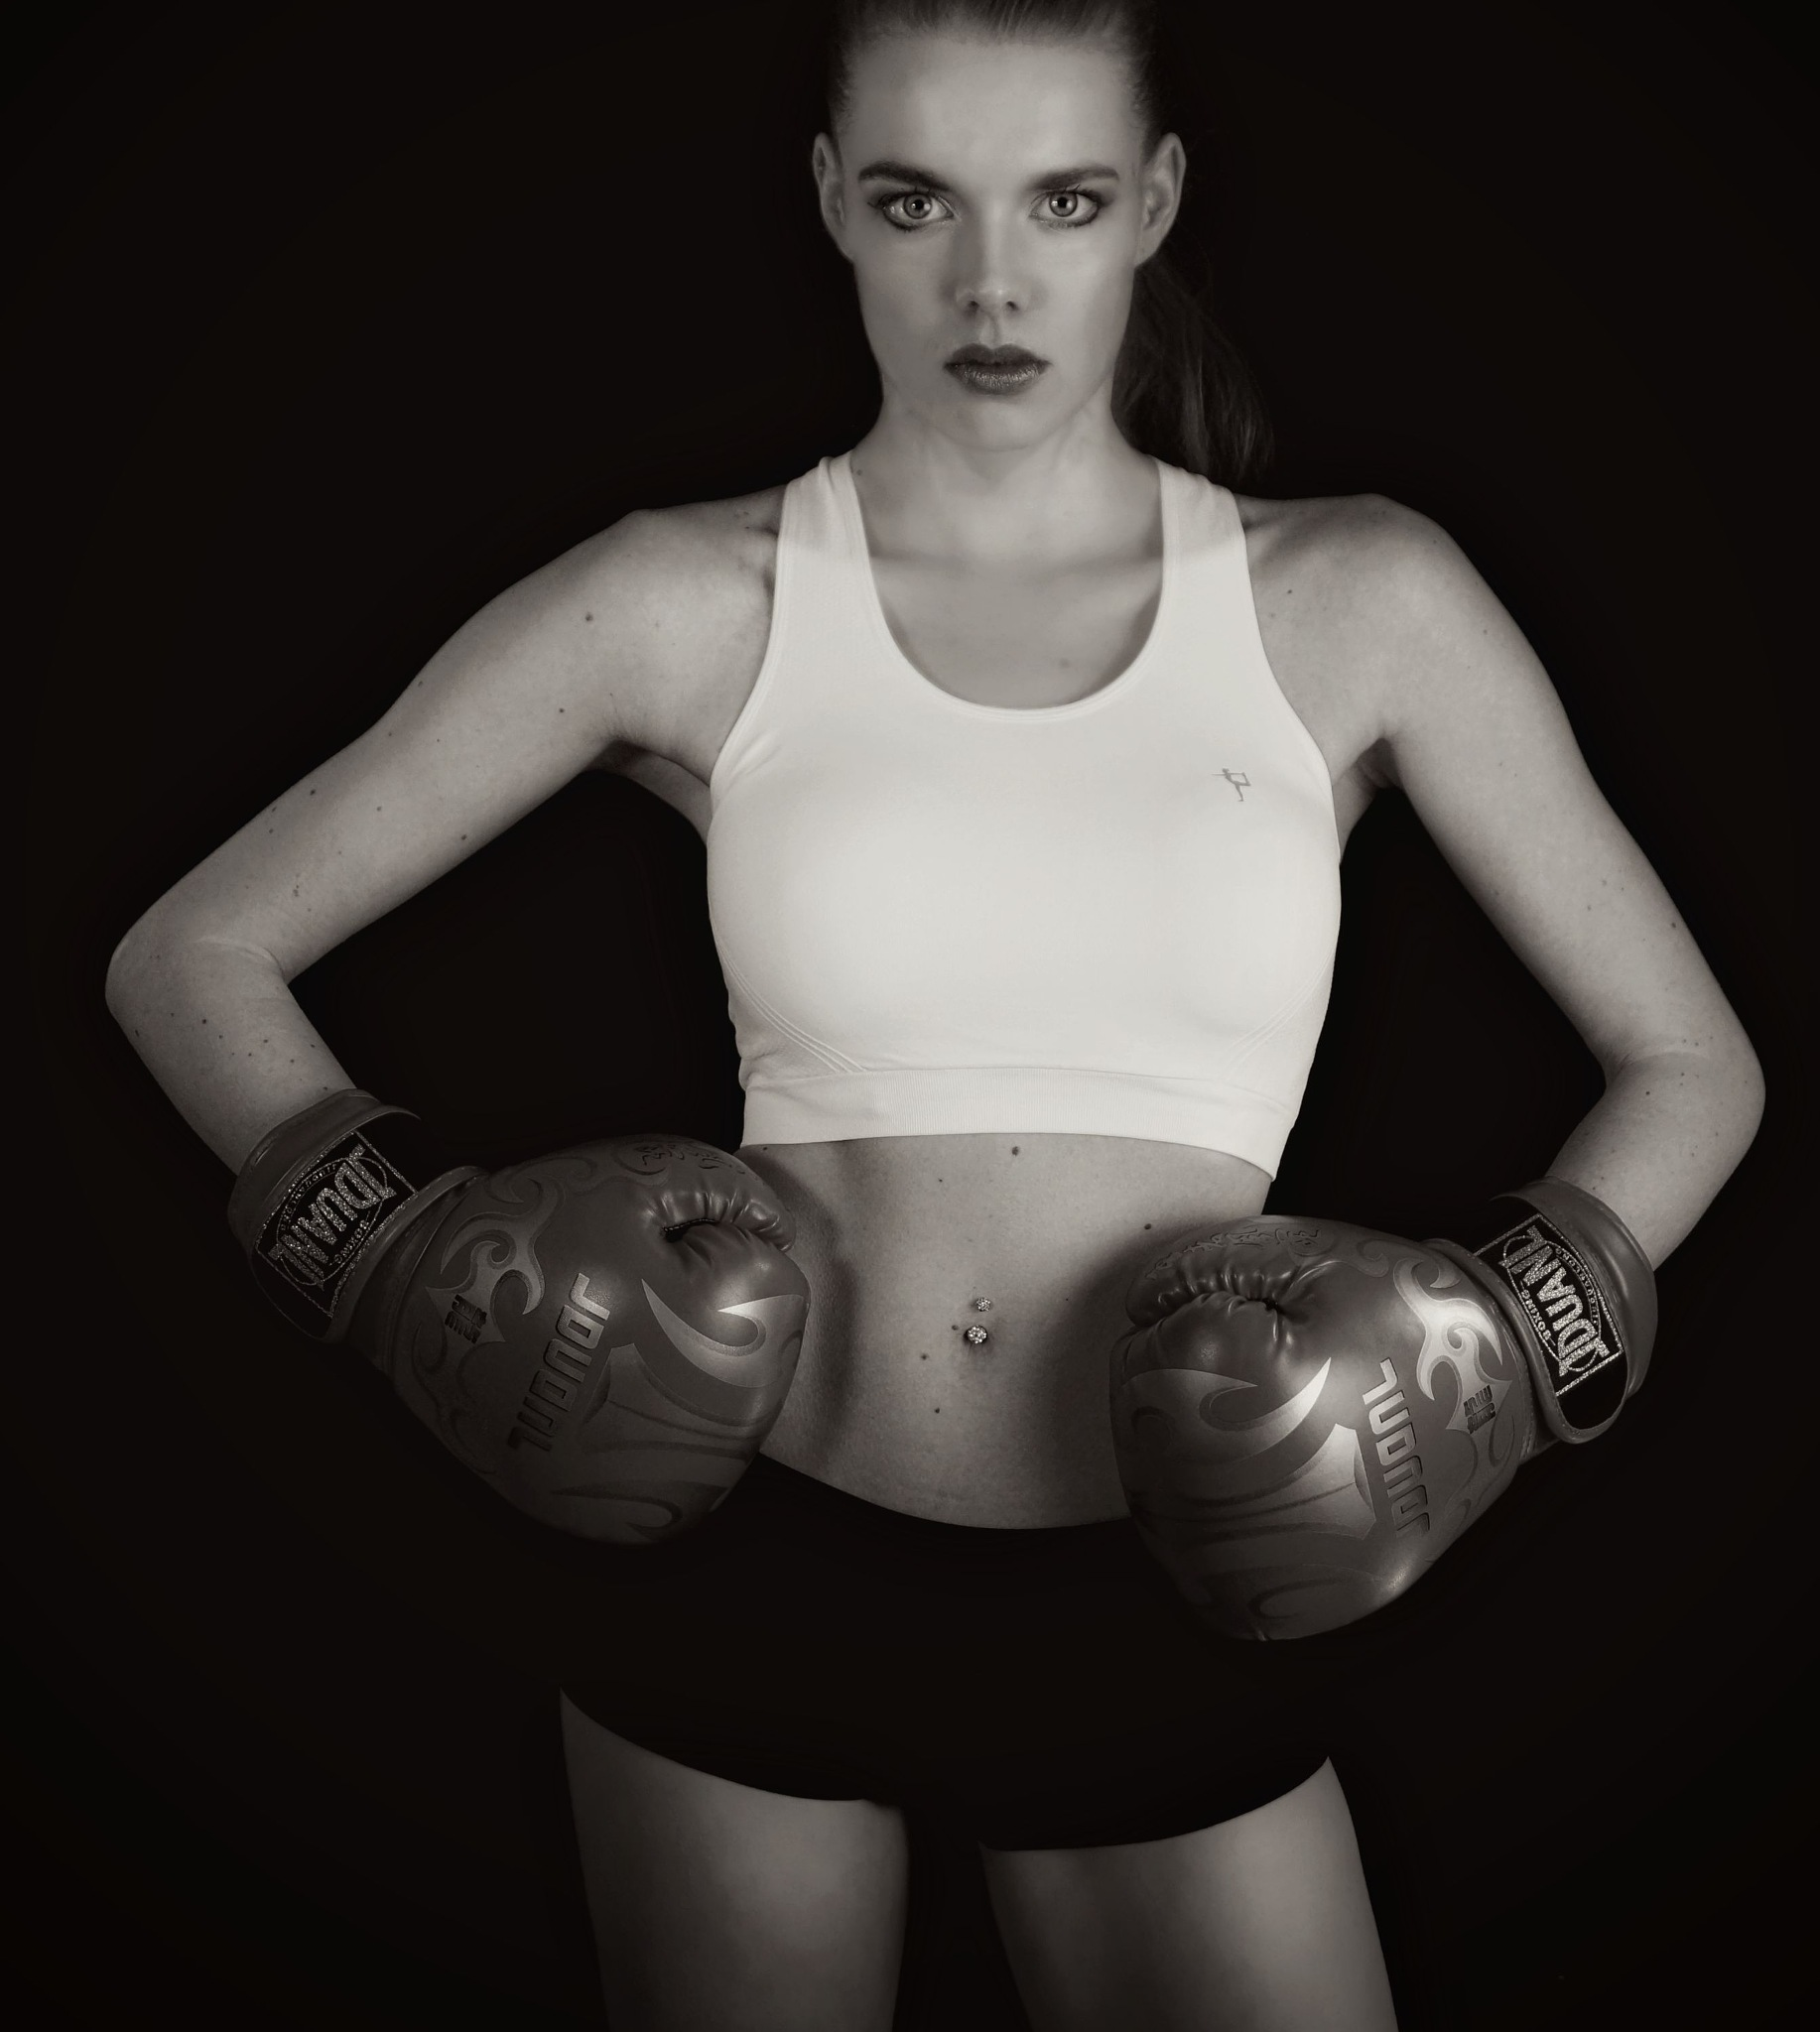 You want to fight? by franckvrolijk